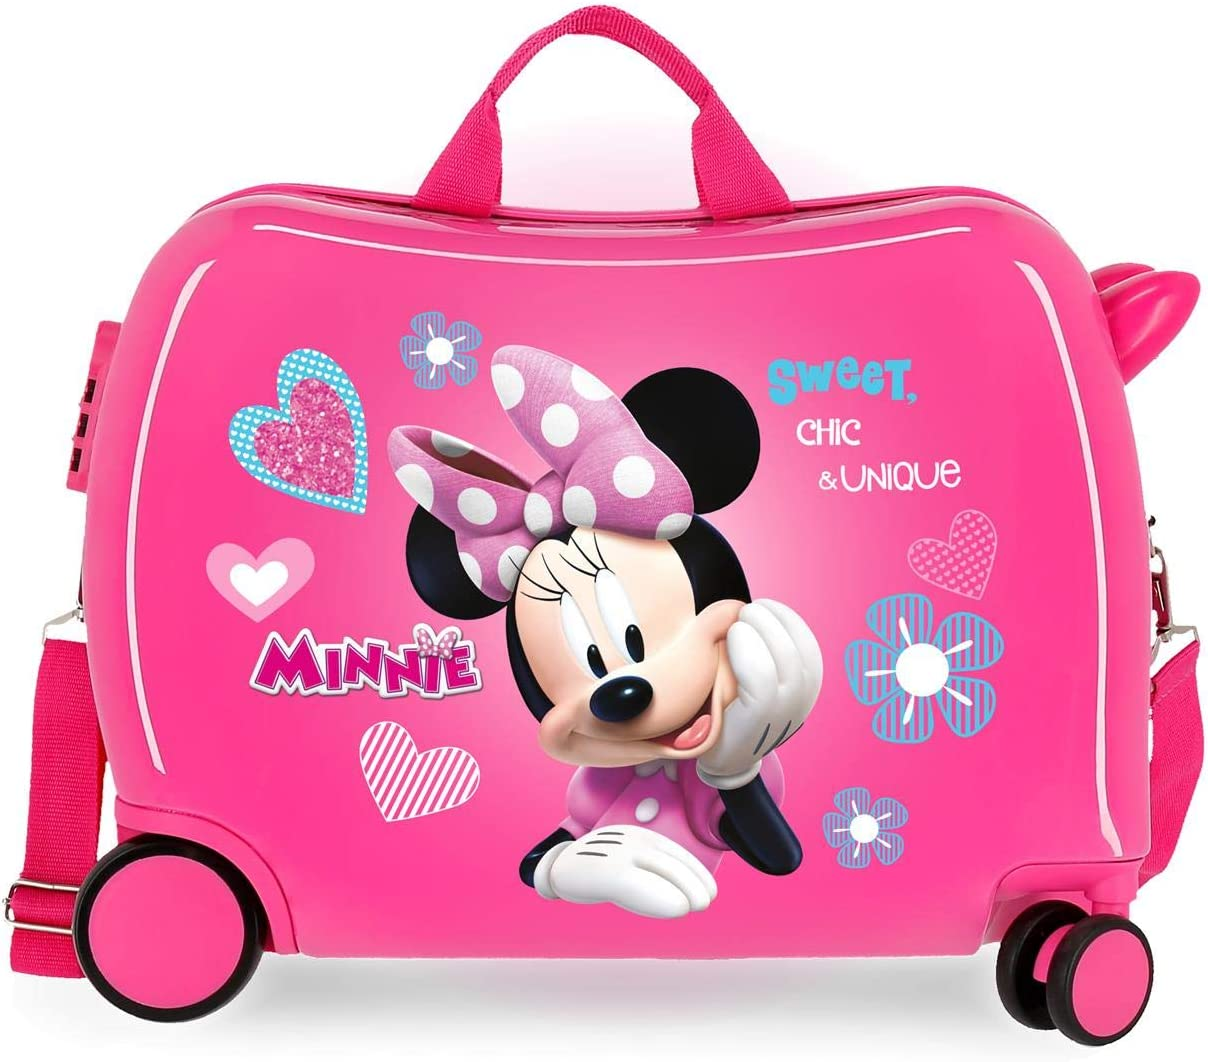 Disney Minnie Fabulous Correpasillos Maleta de Cabina Correpasillos Infantil Rosa 50x39x20 cm   Equipaje de Mano, Trolley de Viaje Ryanair, Easyjet   Maleta Fin de Semana de Viaje Rígida Divertida